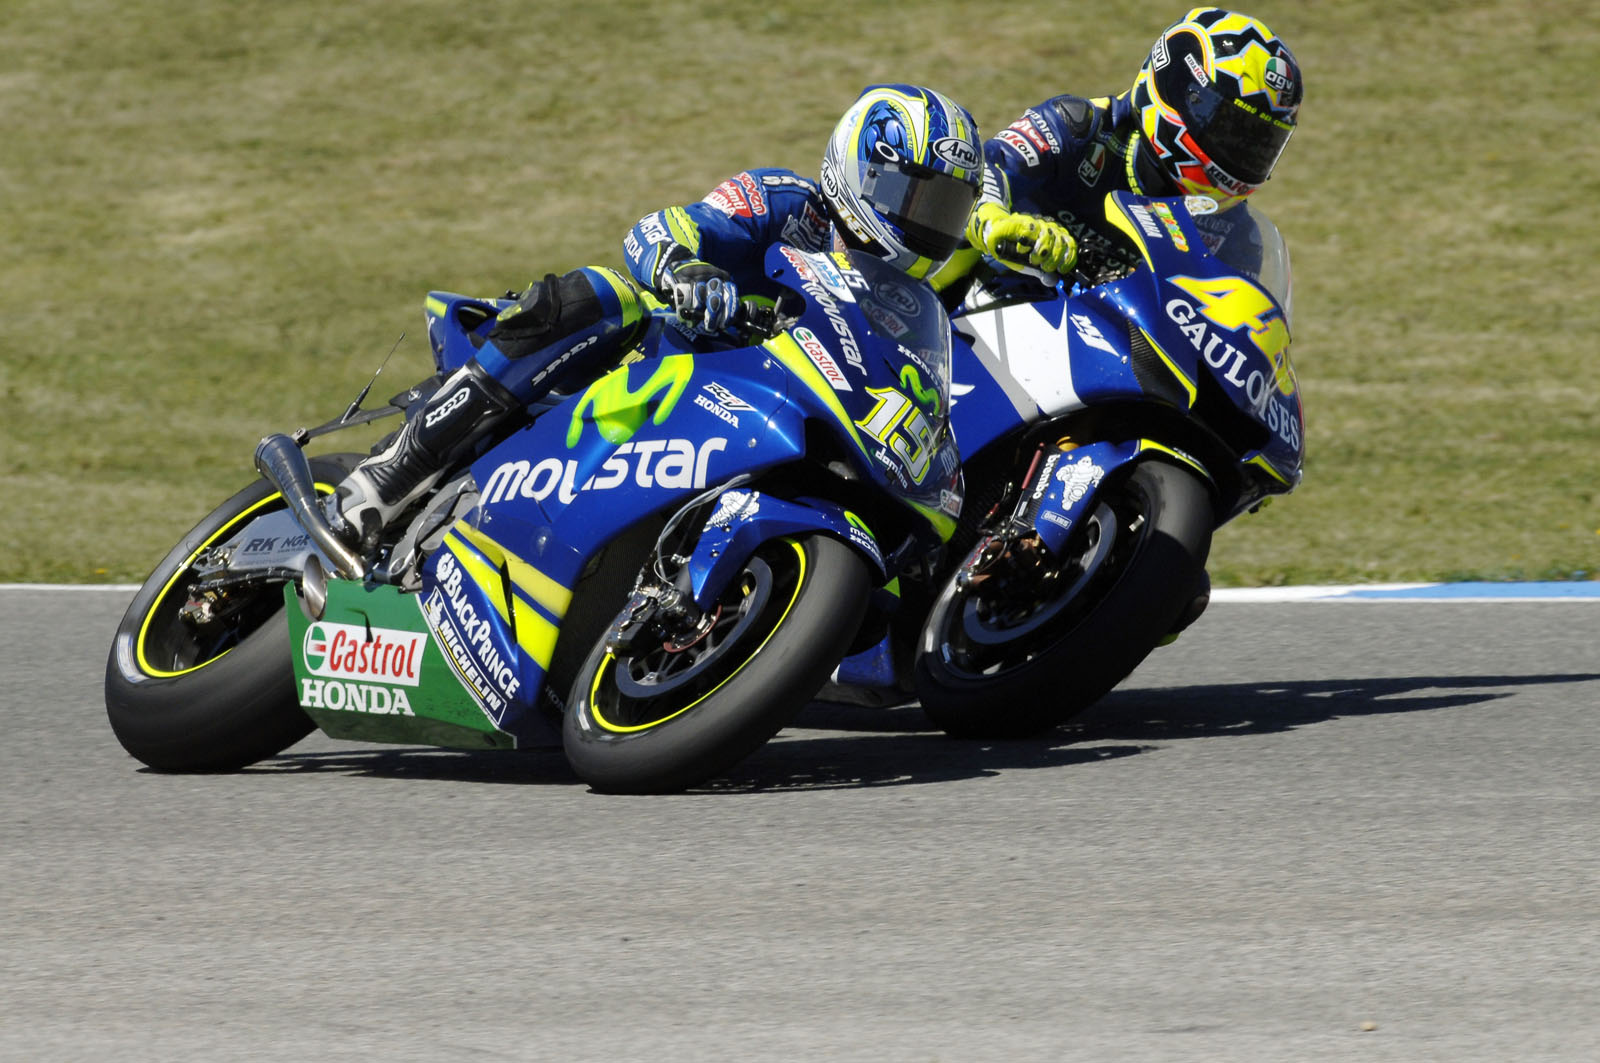 Valentino Rossi dan Sete Gibernau